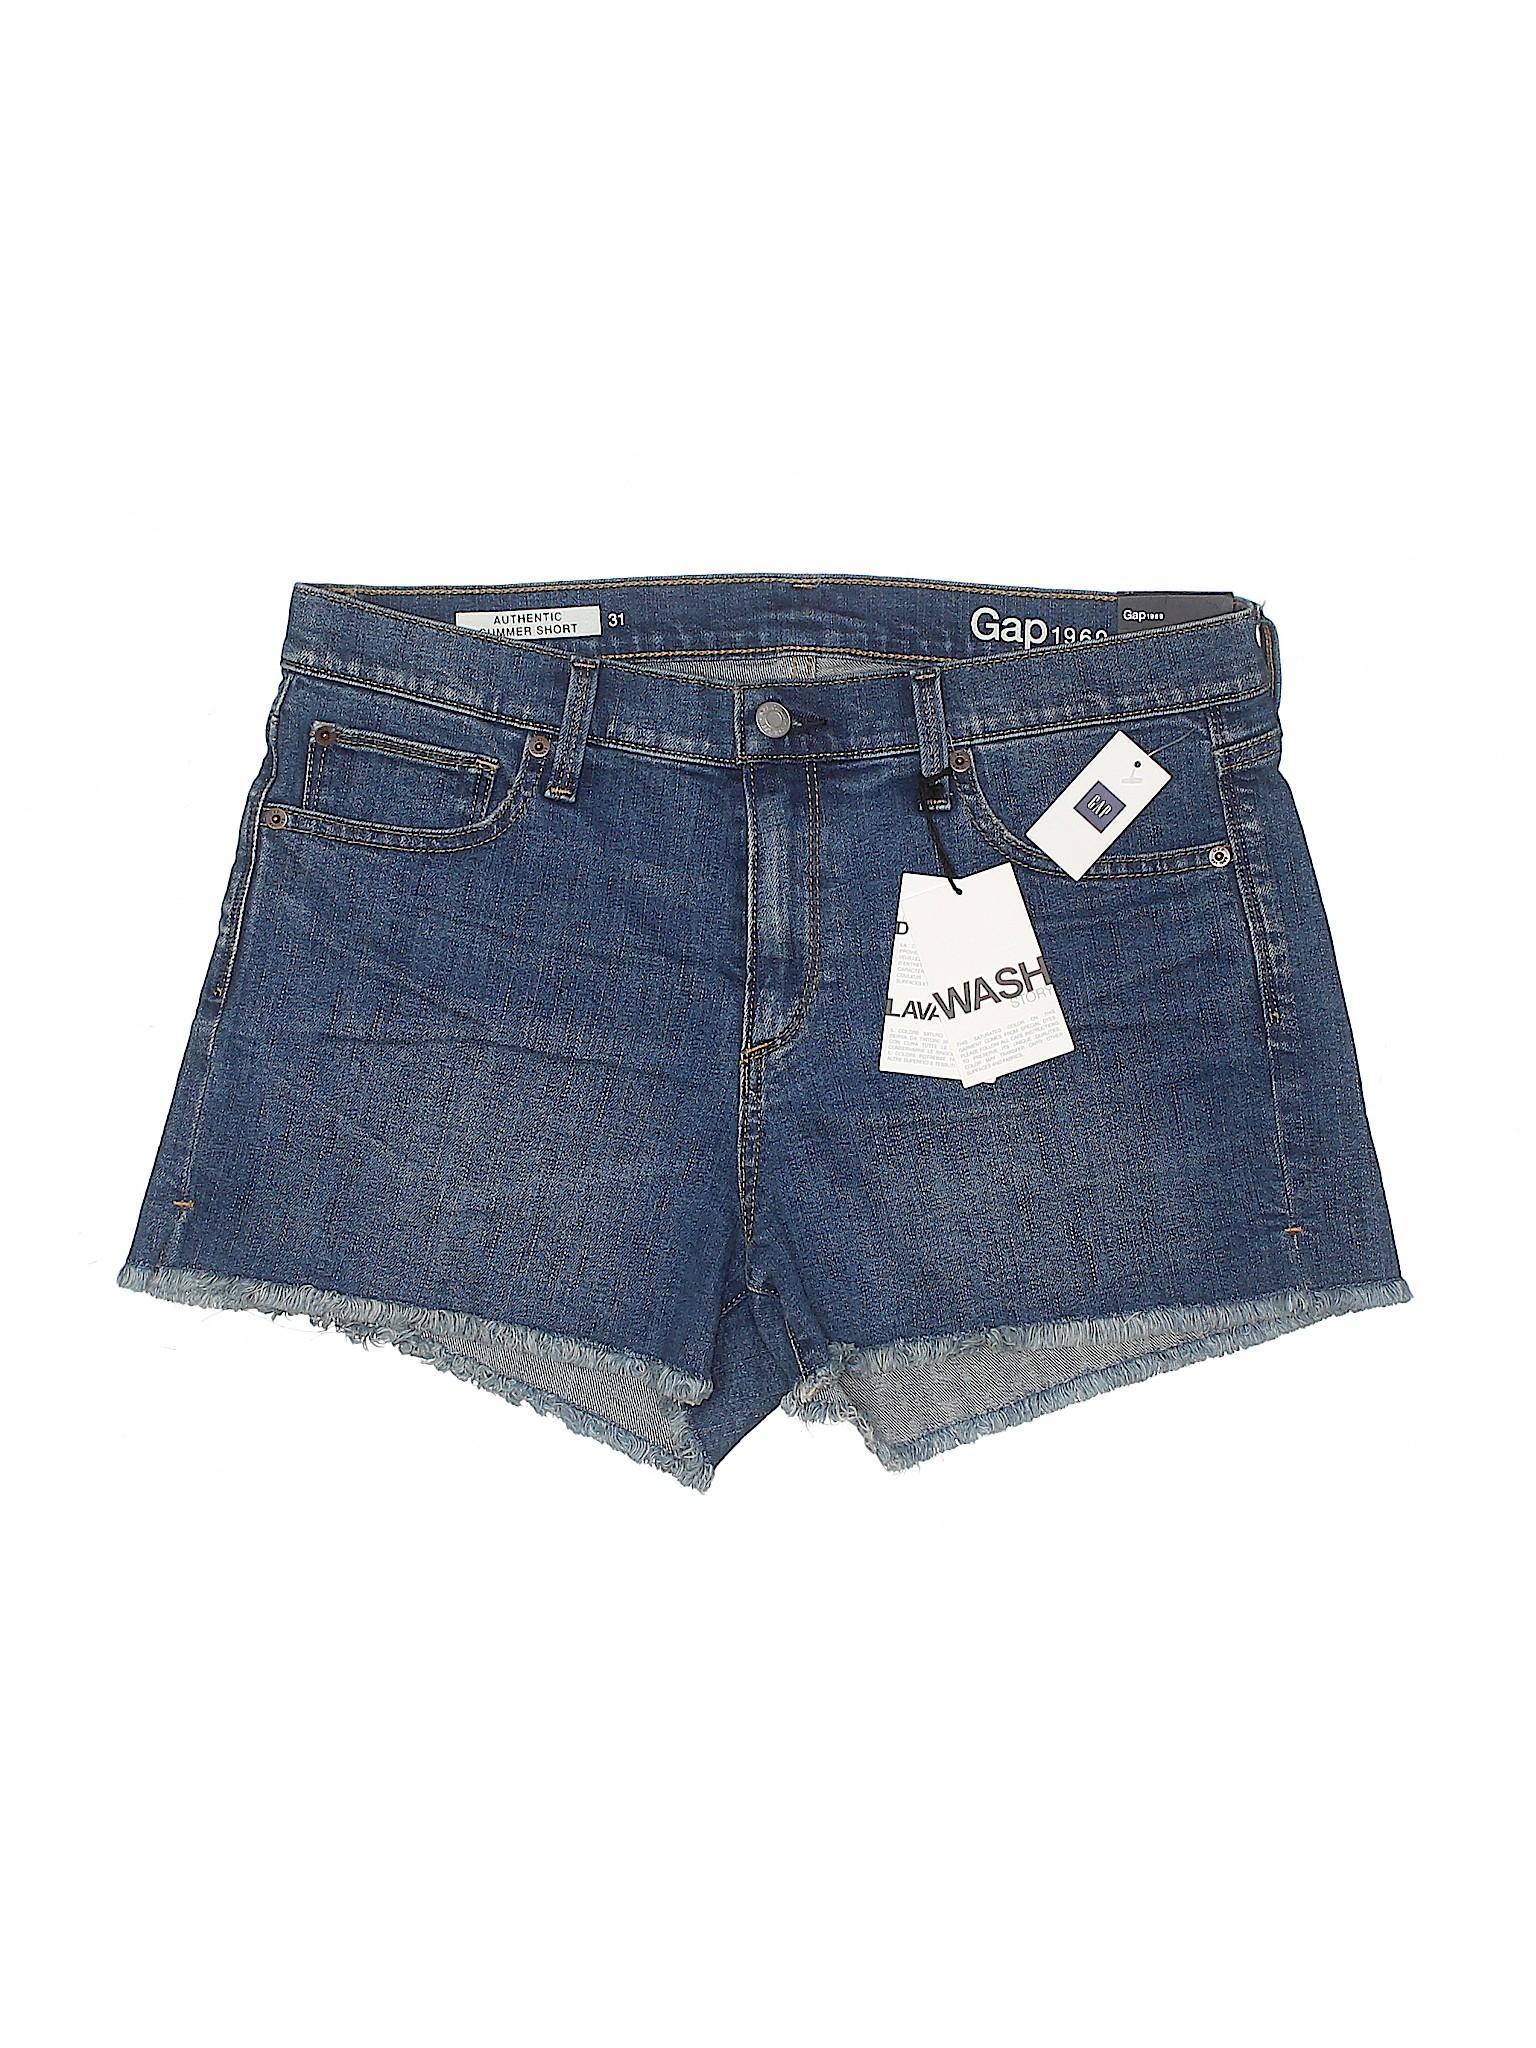 Denim Boutique leisure Denim Gap Boutique Boutique leisure leisure Shorts Shorts Gap OwHfq1Pw